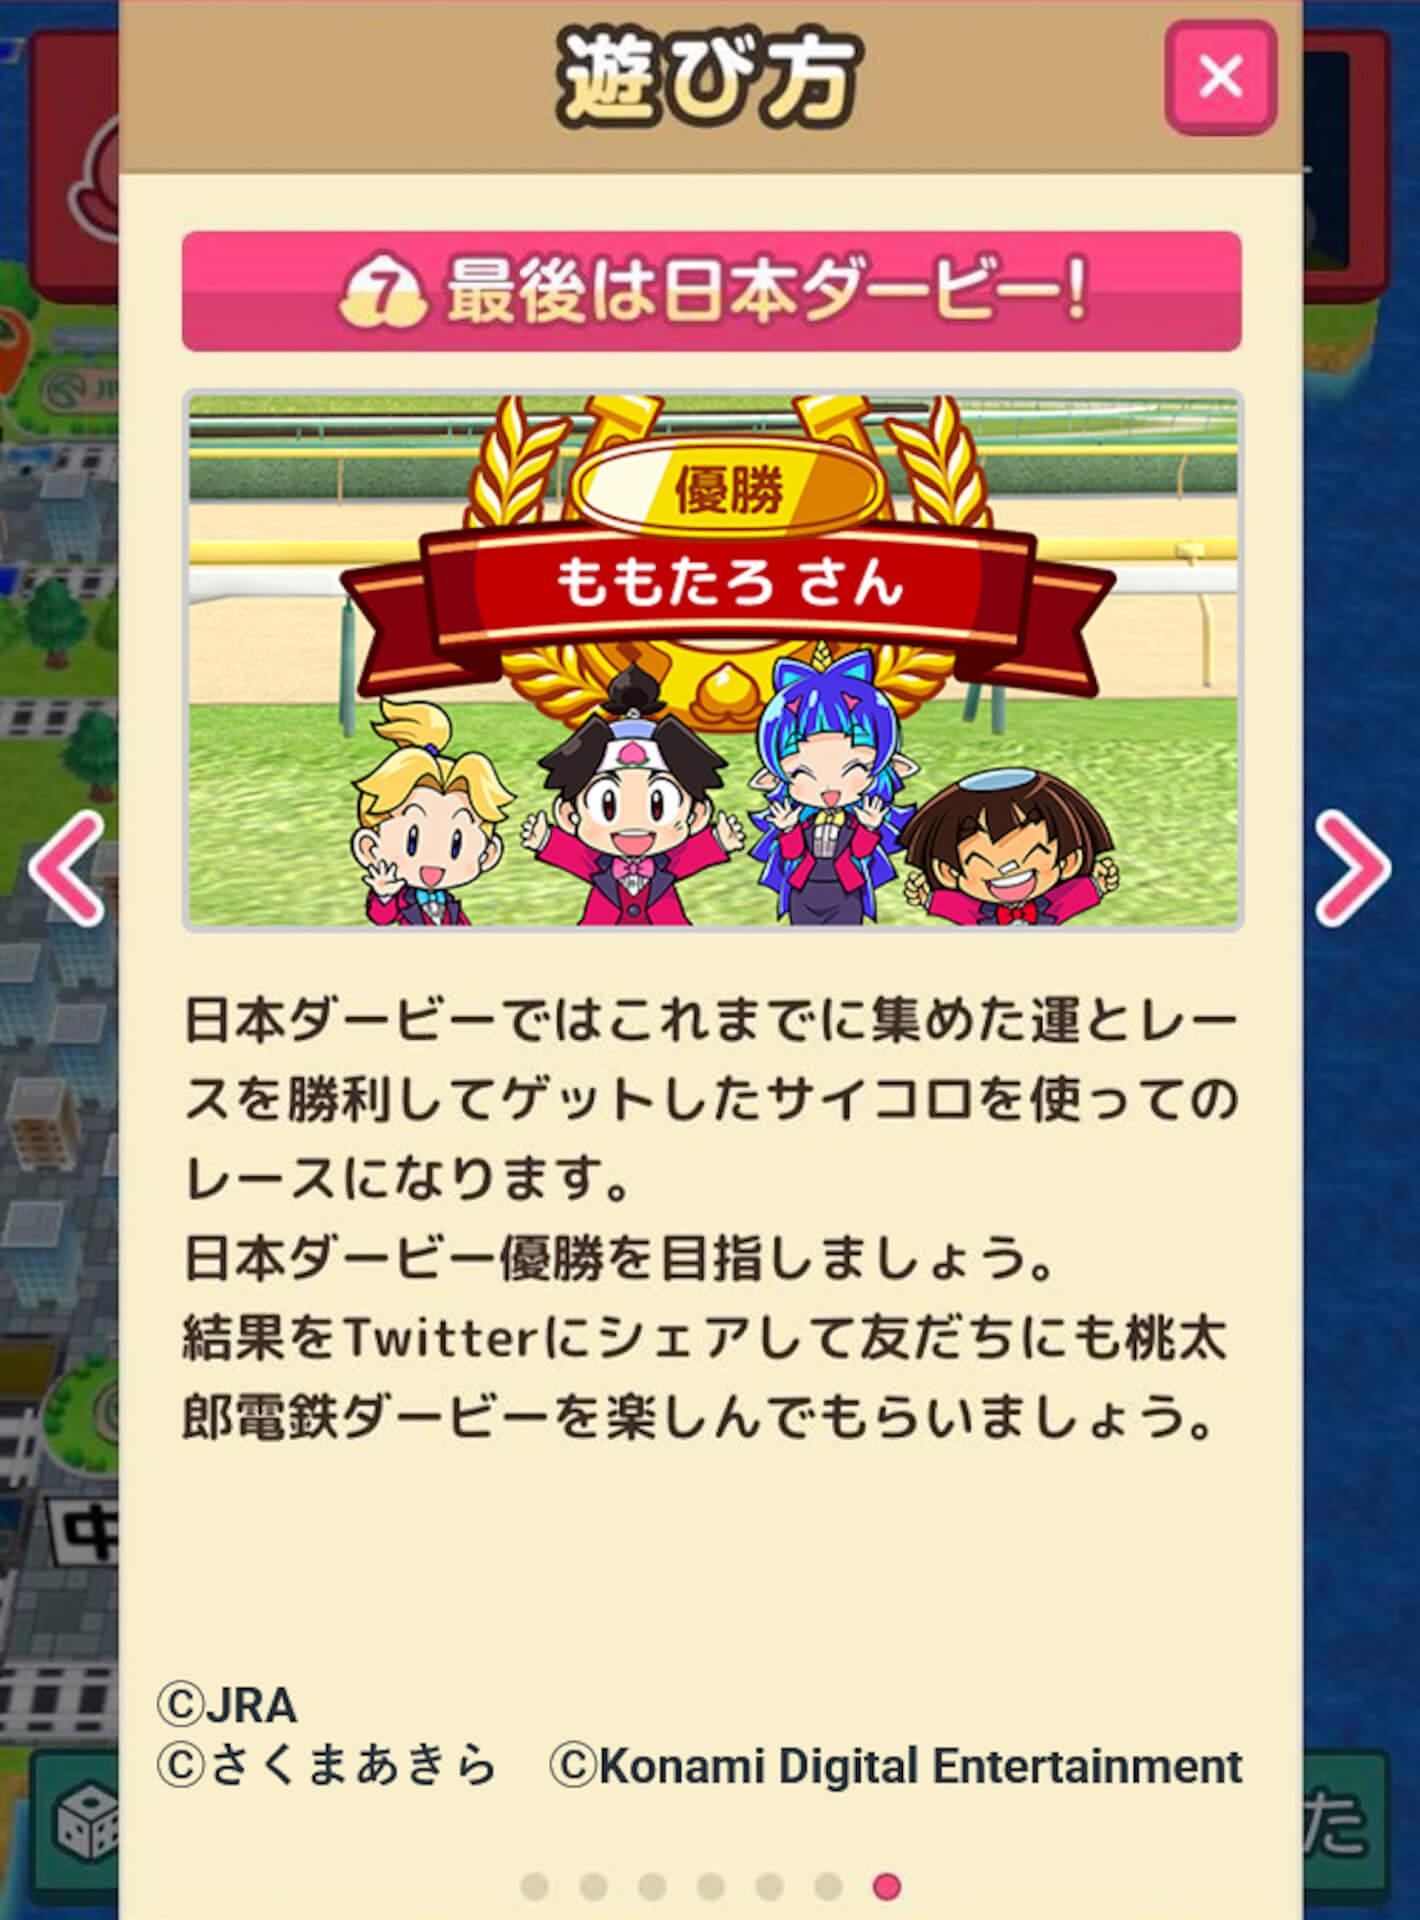 JRAと桃太郎電鉄が日本ダービーでコラボ!1万円分の電子マネーギフトが当たるTwitterキャンペーンも実施 tech210517_jra-momotetsu-210517_5